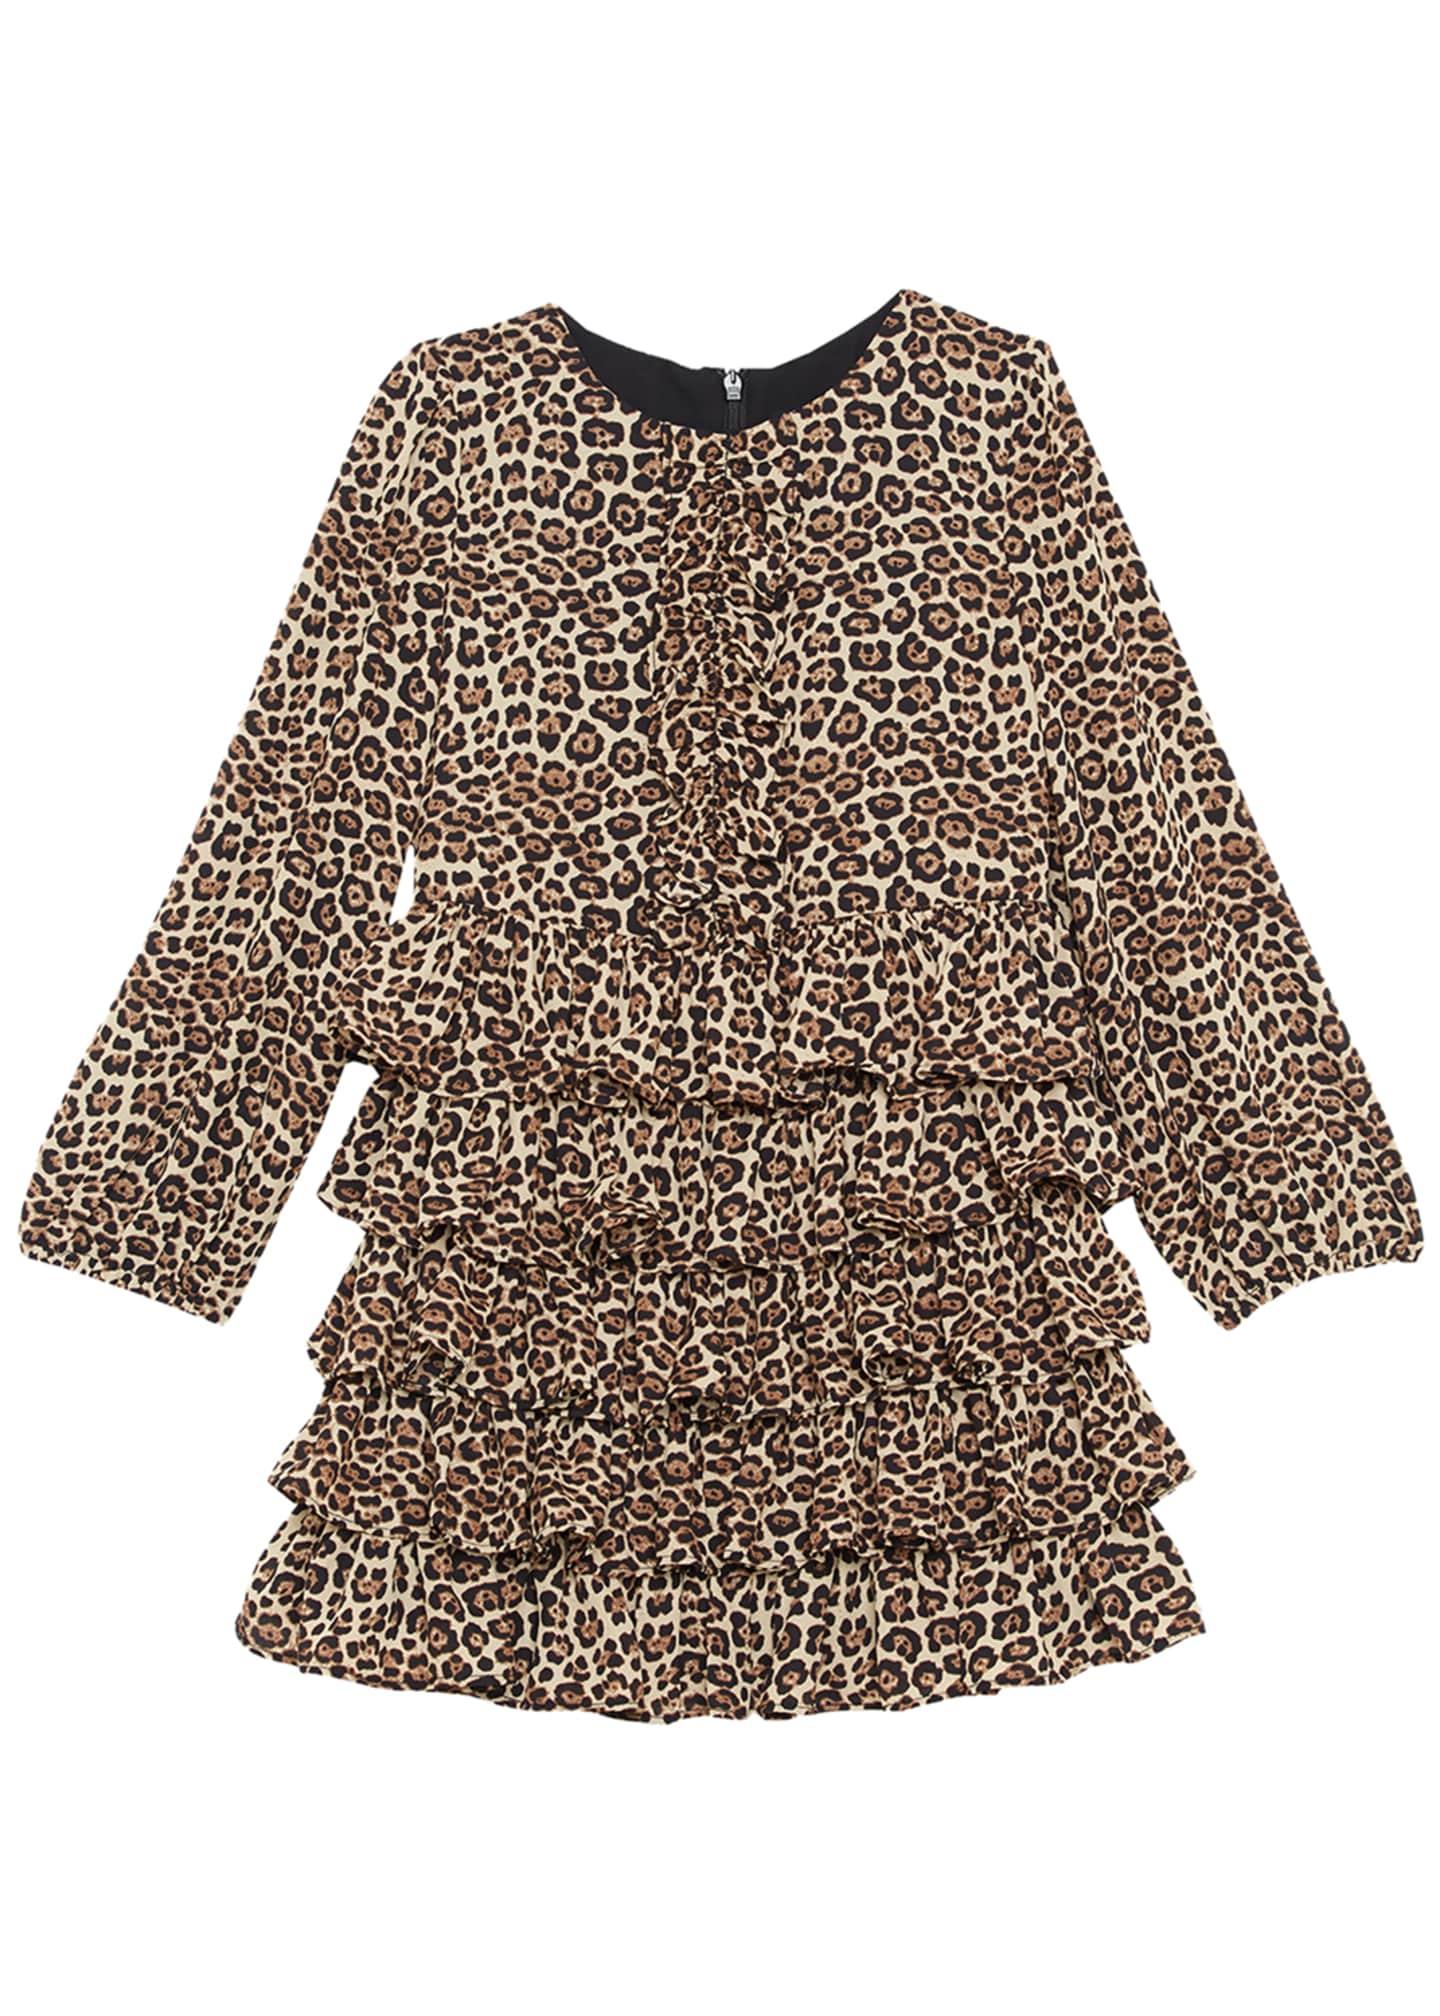 Bardot Junior Girl's Tia Animal-Print Dress, Size 7-18